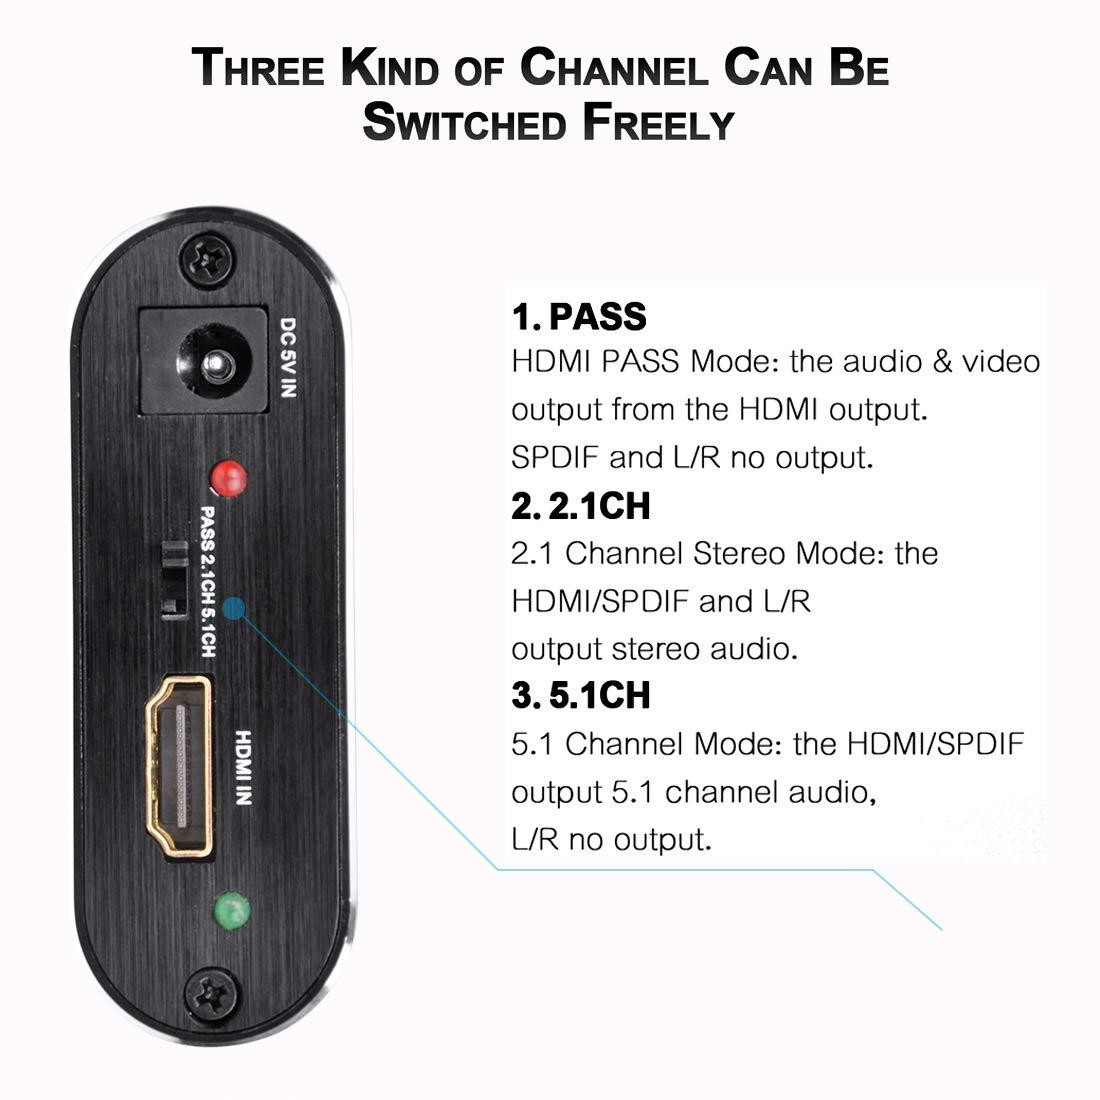 Iseebiz 4K HDMI Audio Splitter HDMI zu HDMI SPDIF 3.5mm Stereo Audio Splitter HDMI Audio Extractor Audio Konverter Converter Adapter Support ARC Function